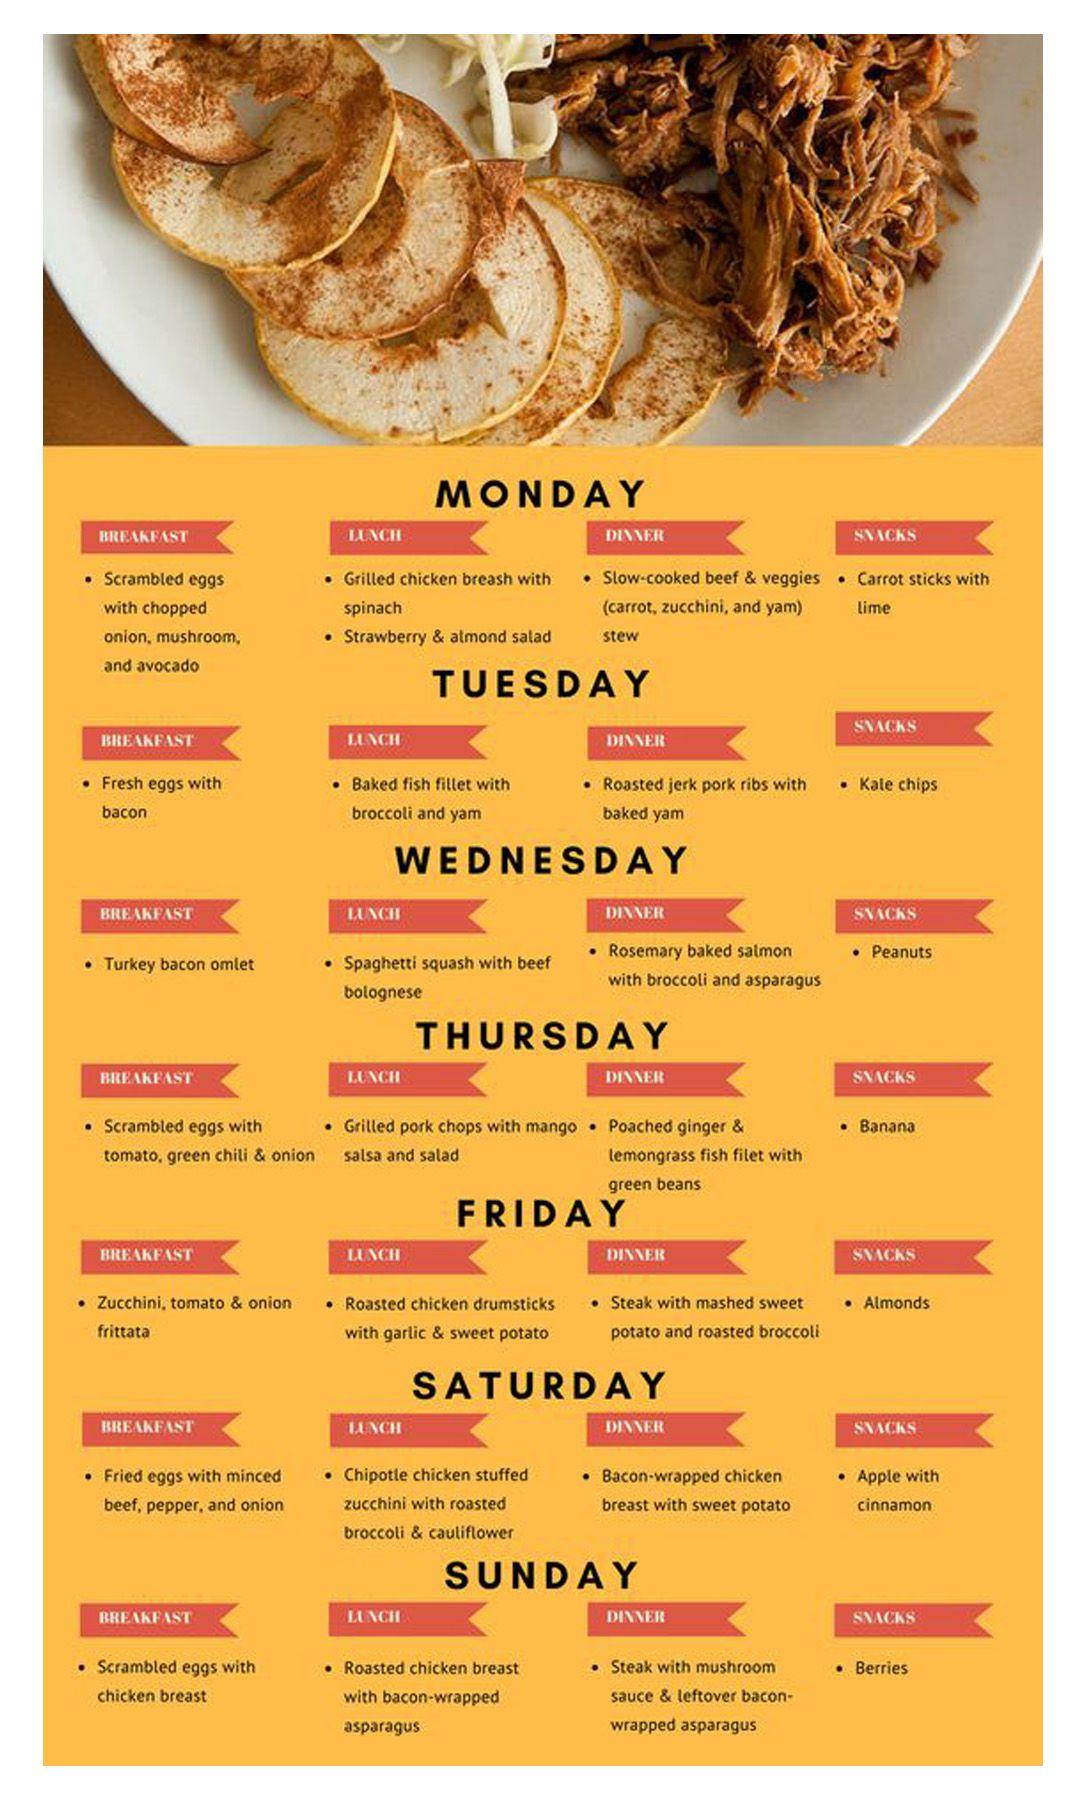 keto diet for beginners week 1 shopping list